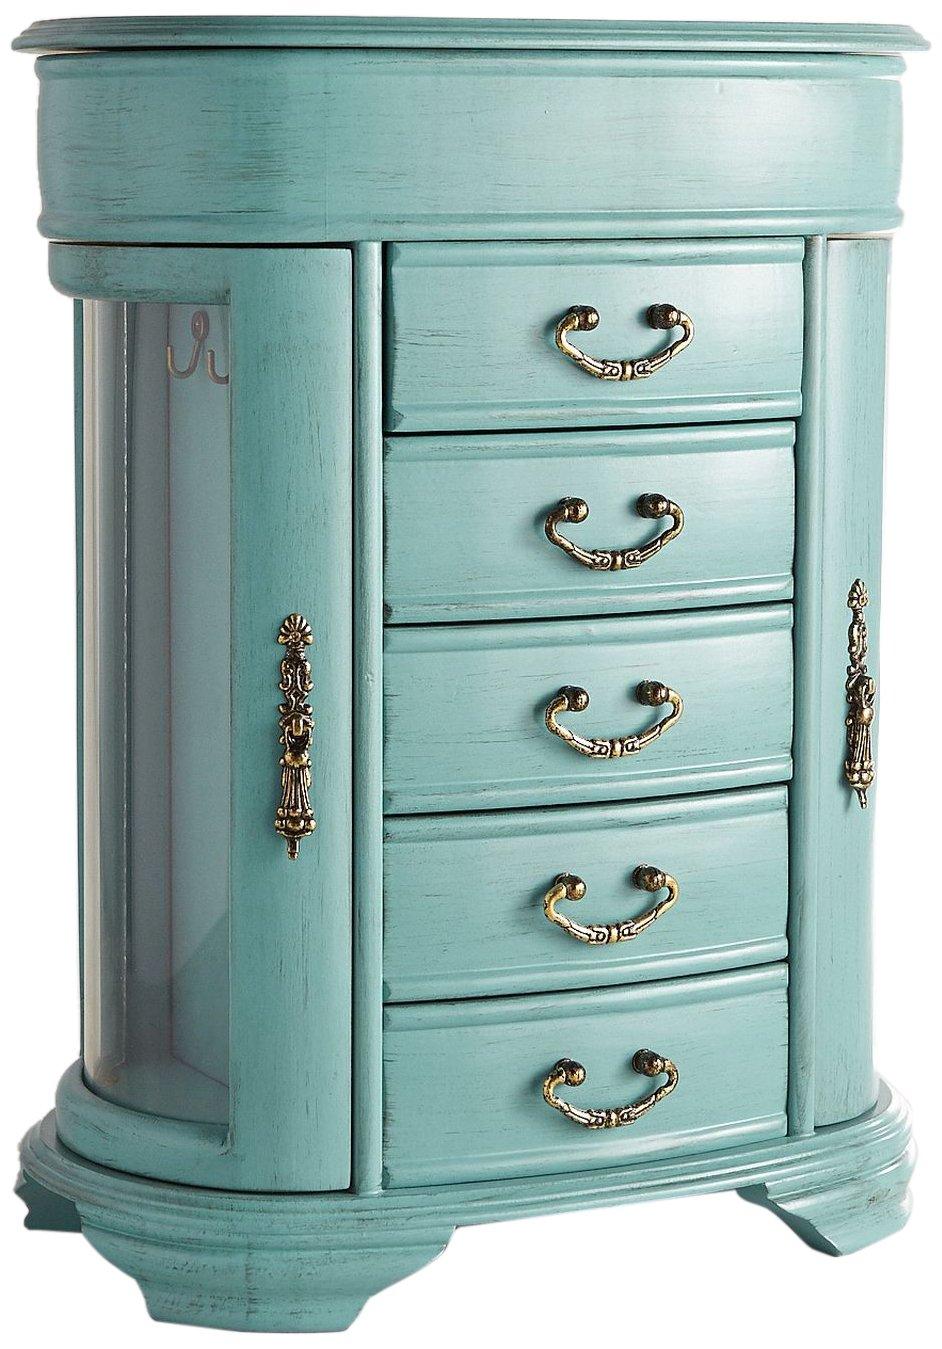 Hives & Honey Daphne Oval Glass Turquoise Jewelry Chest Jewelry Organizer Box Case Mirrored Storage 6006-860